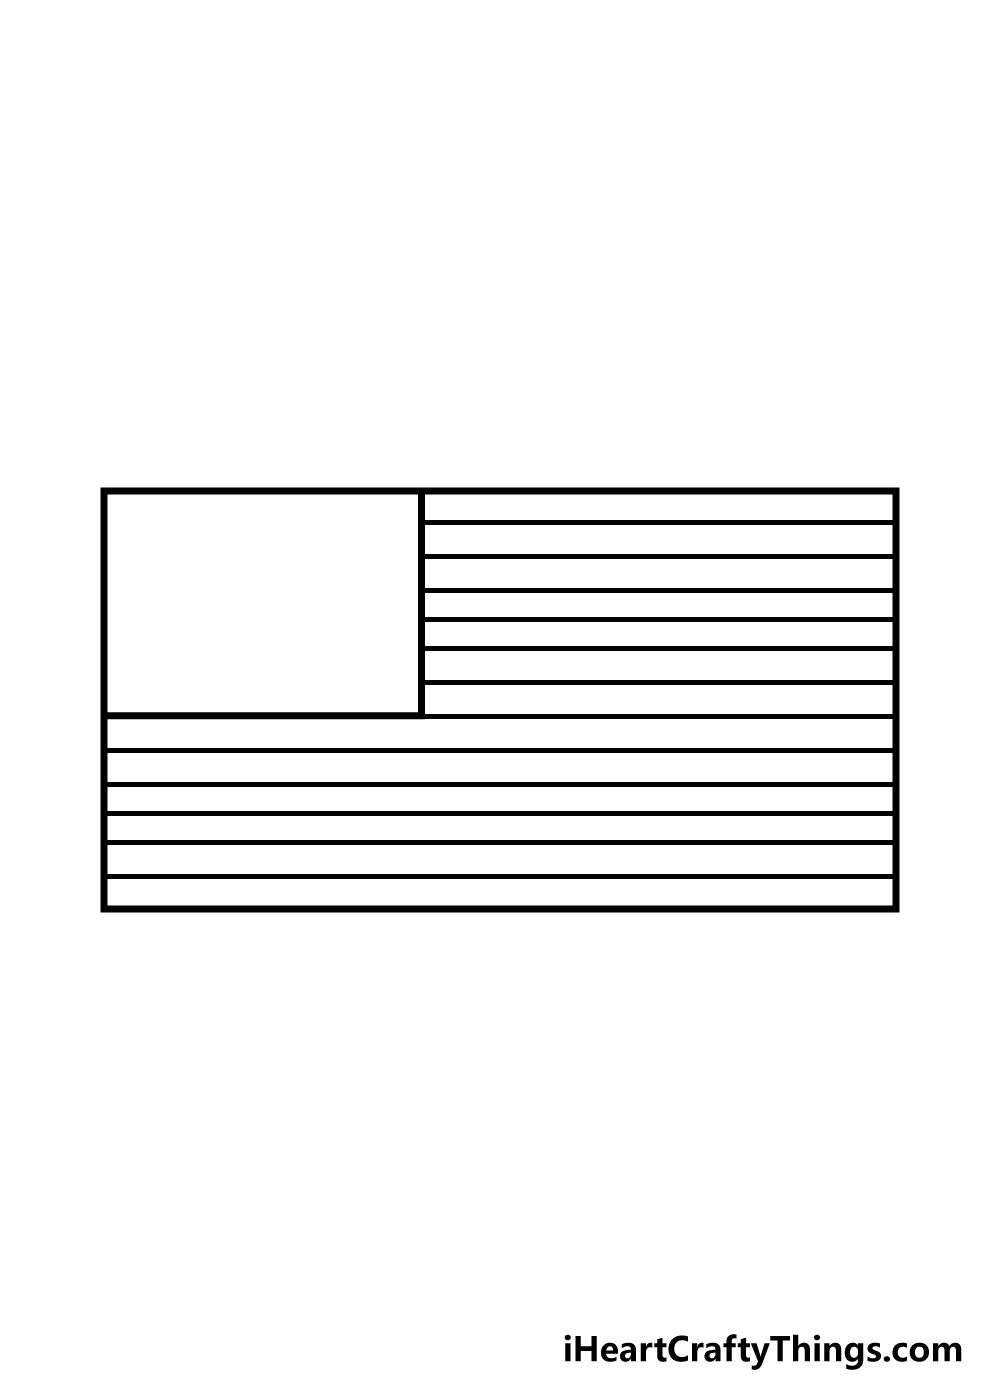 drawing american flag step 4